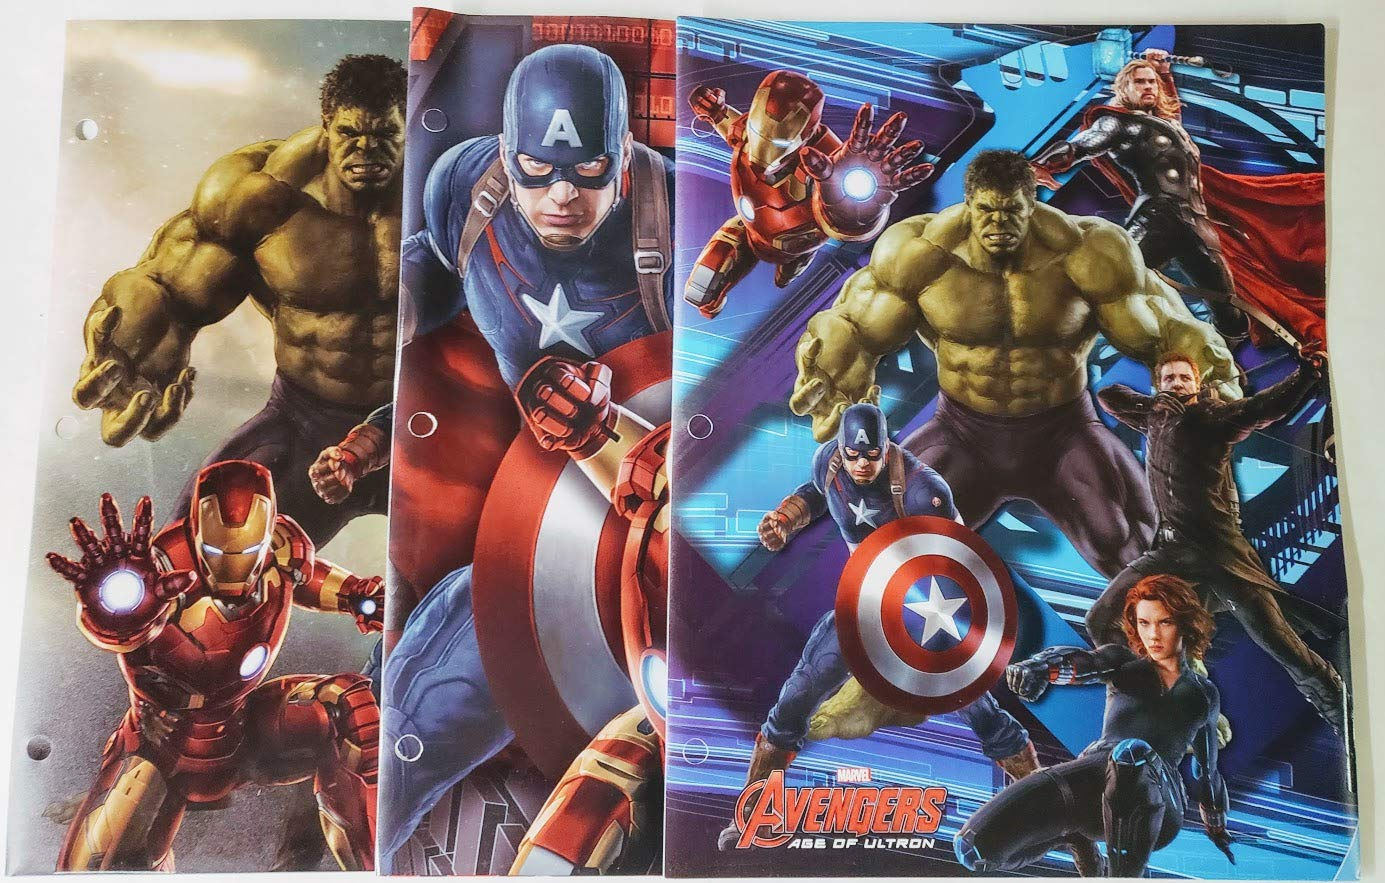 Marvel Avengers Poly Plastic Portfolio Folders -Set of 3 by Big City Bargains (Image #1)